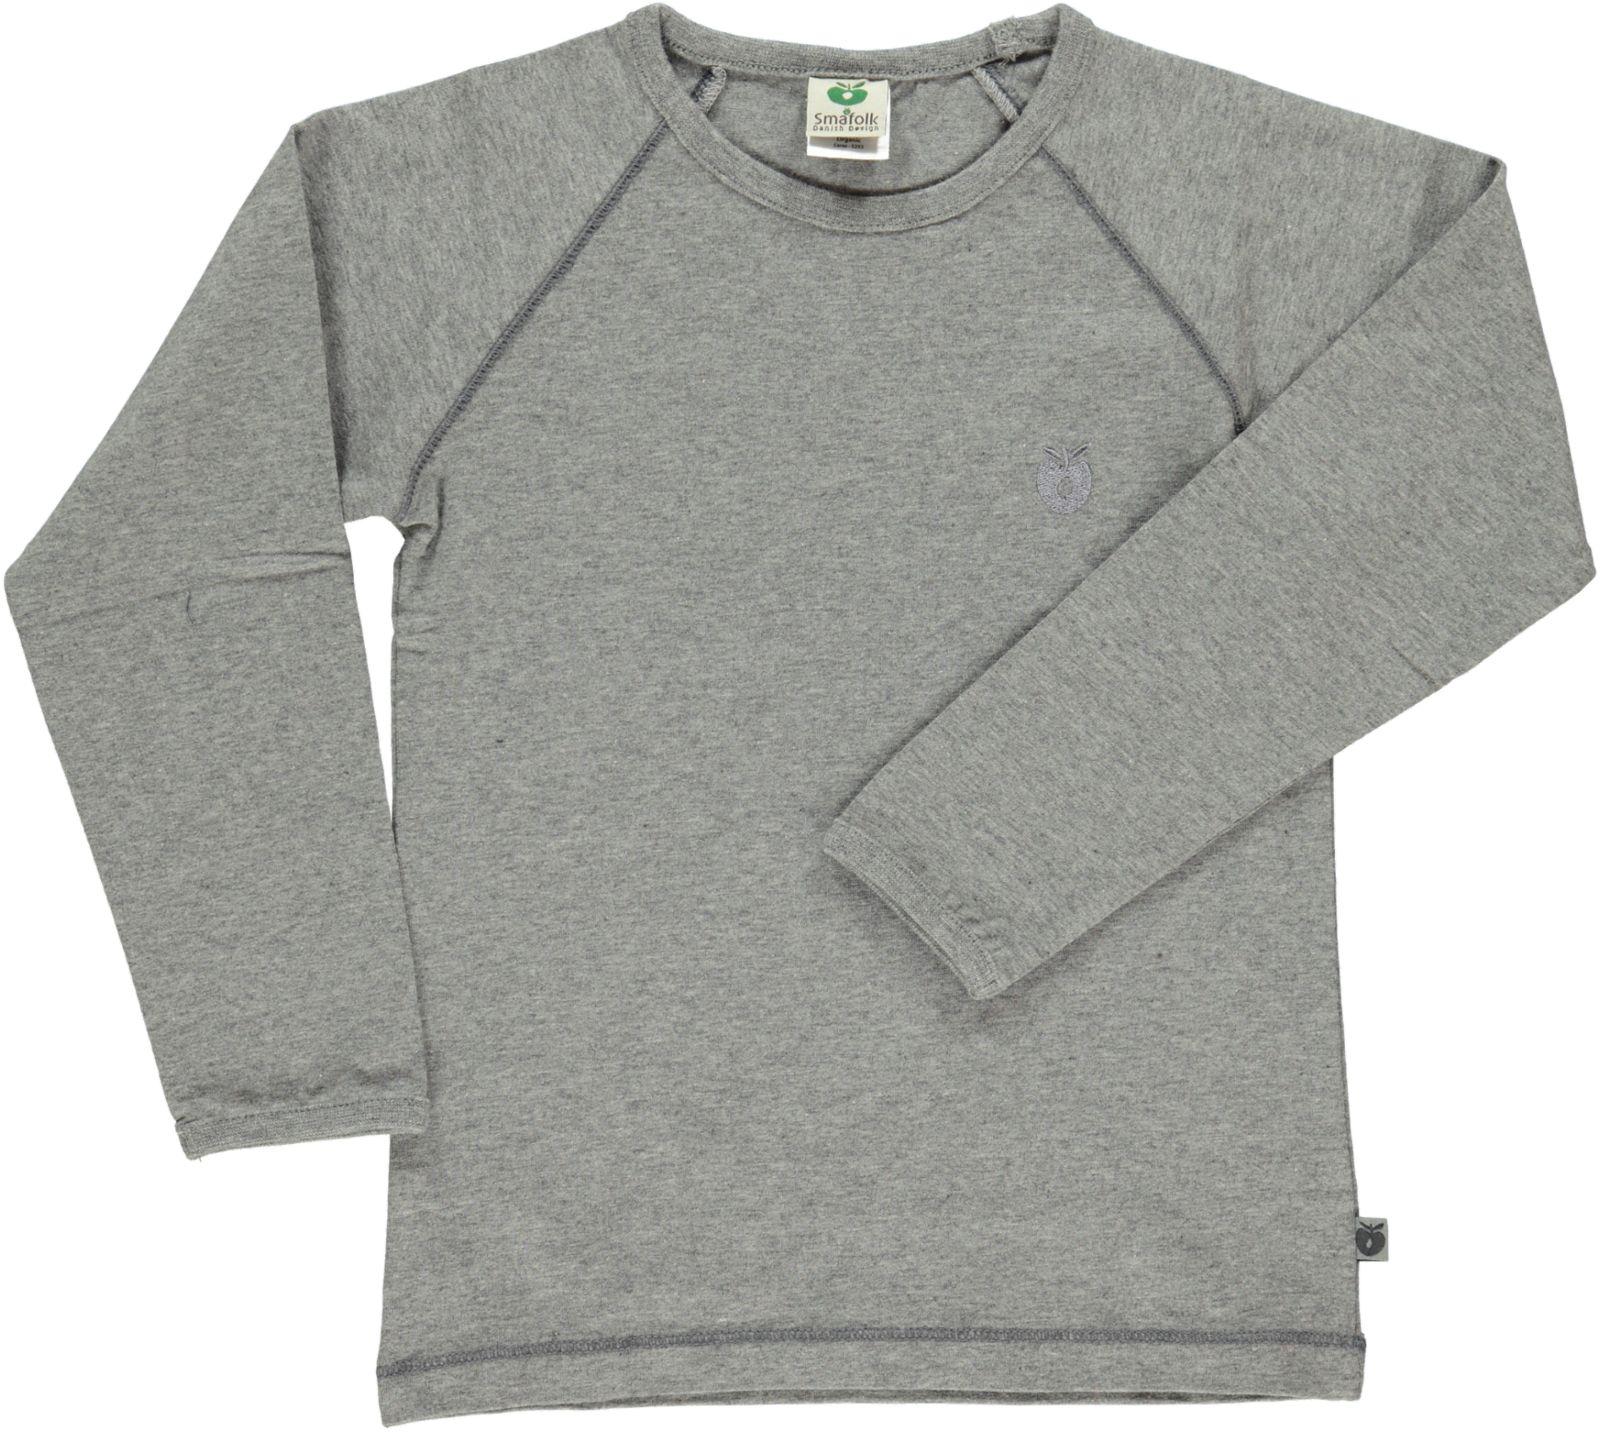 Småfolk - Organic Basic Longsleved T-Shirt - M. Grey Mix